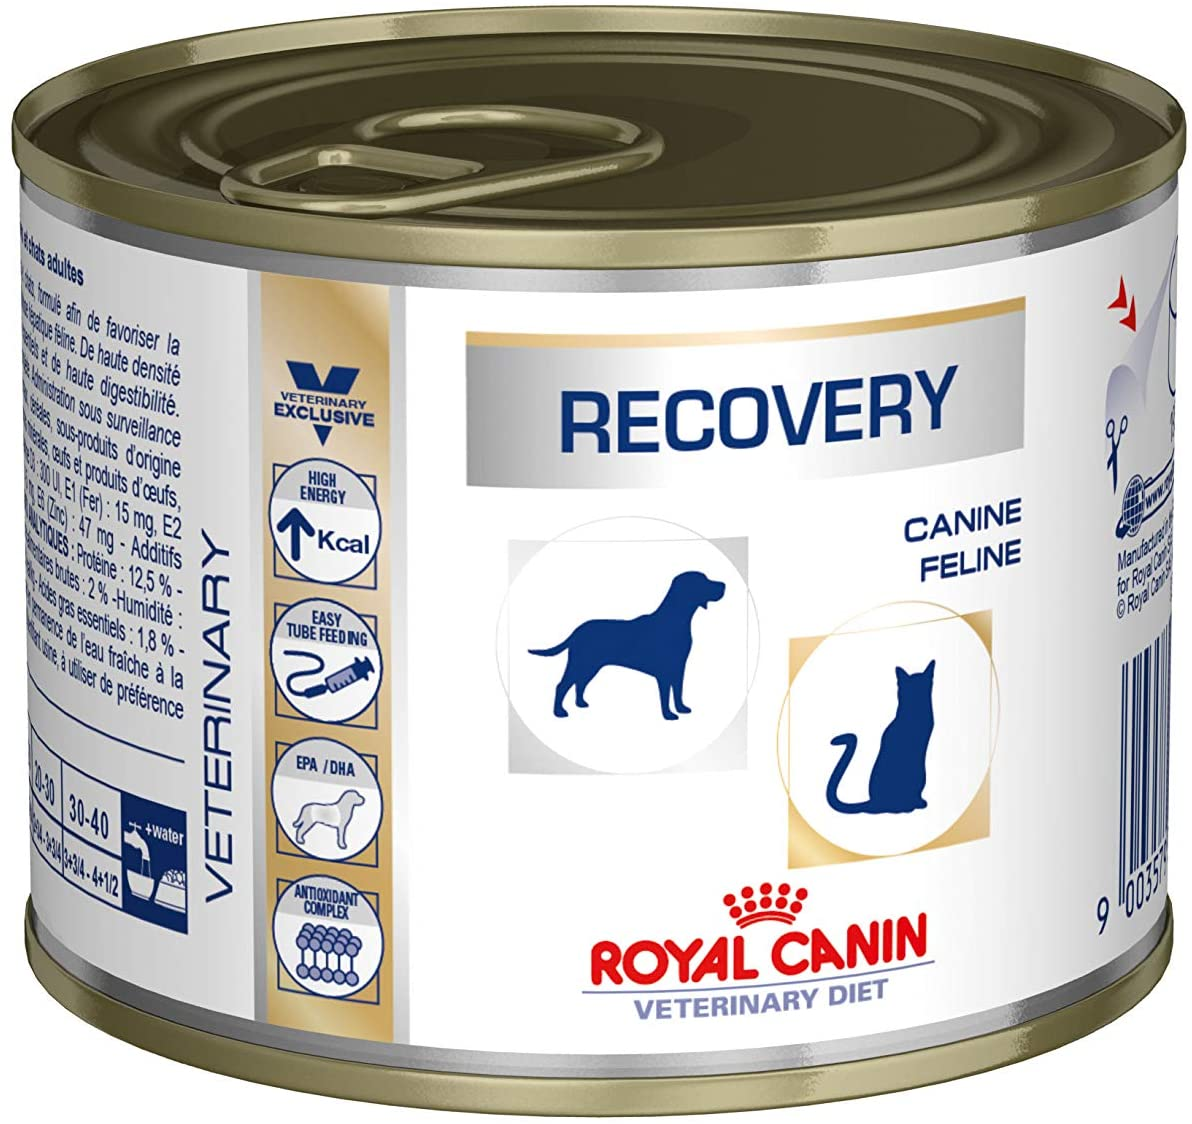 ROYAL CANIN Vet Dog Cat Recovery boite - 12 X 195g